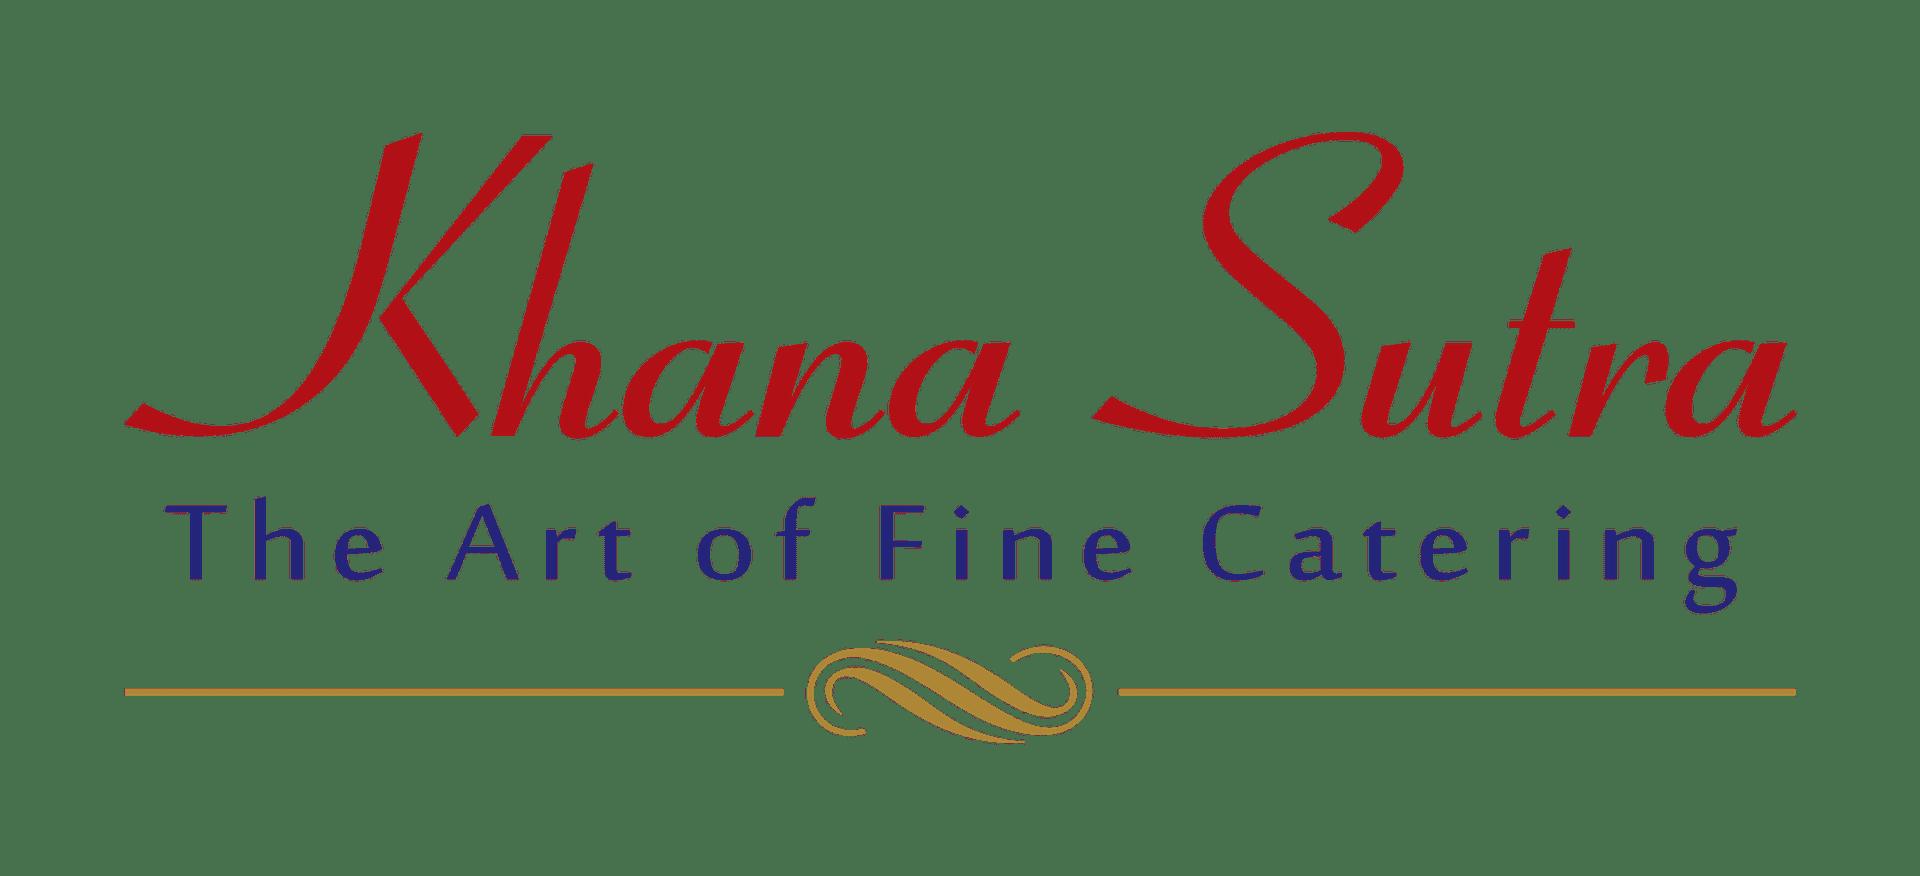 Khana Sutra image